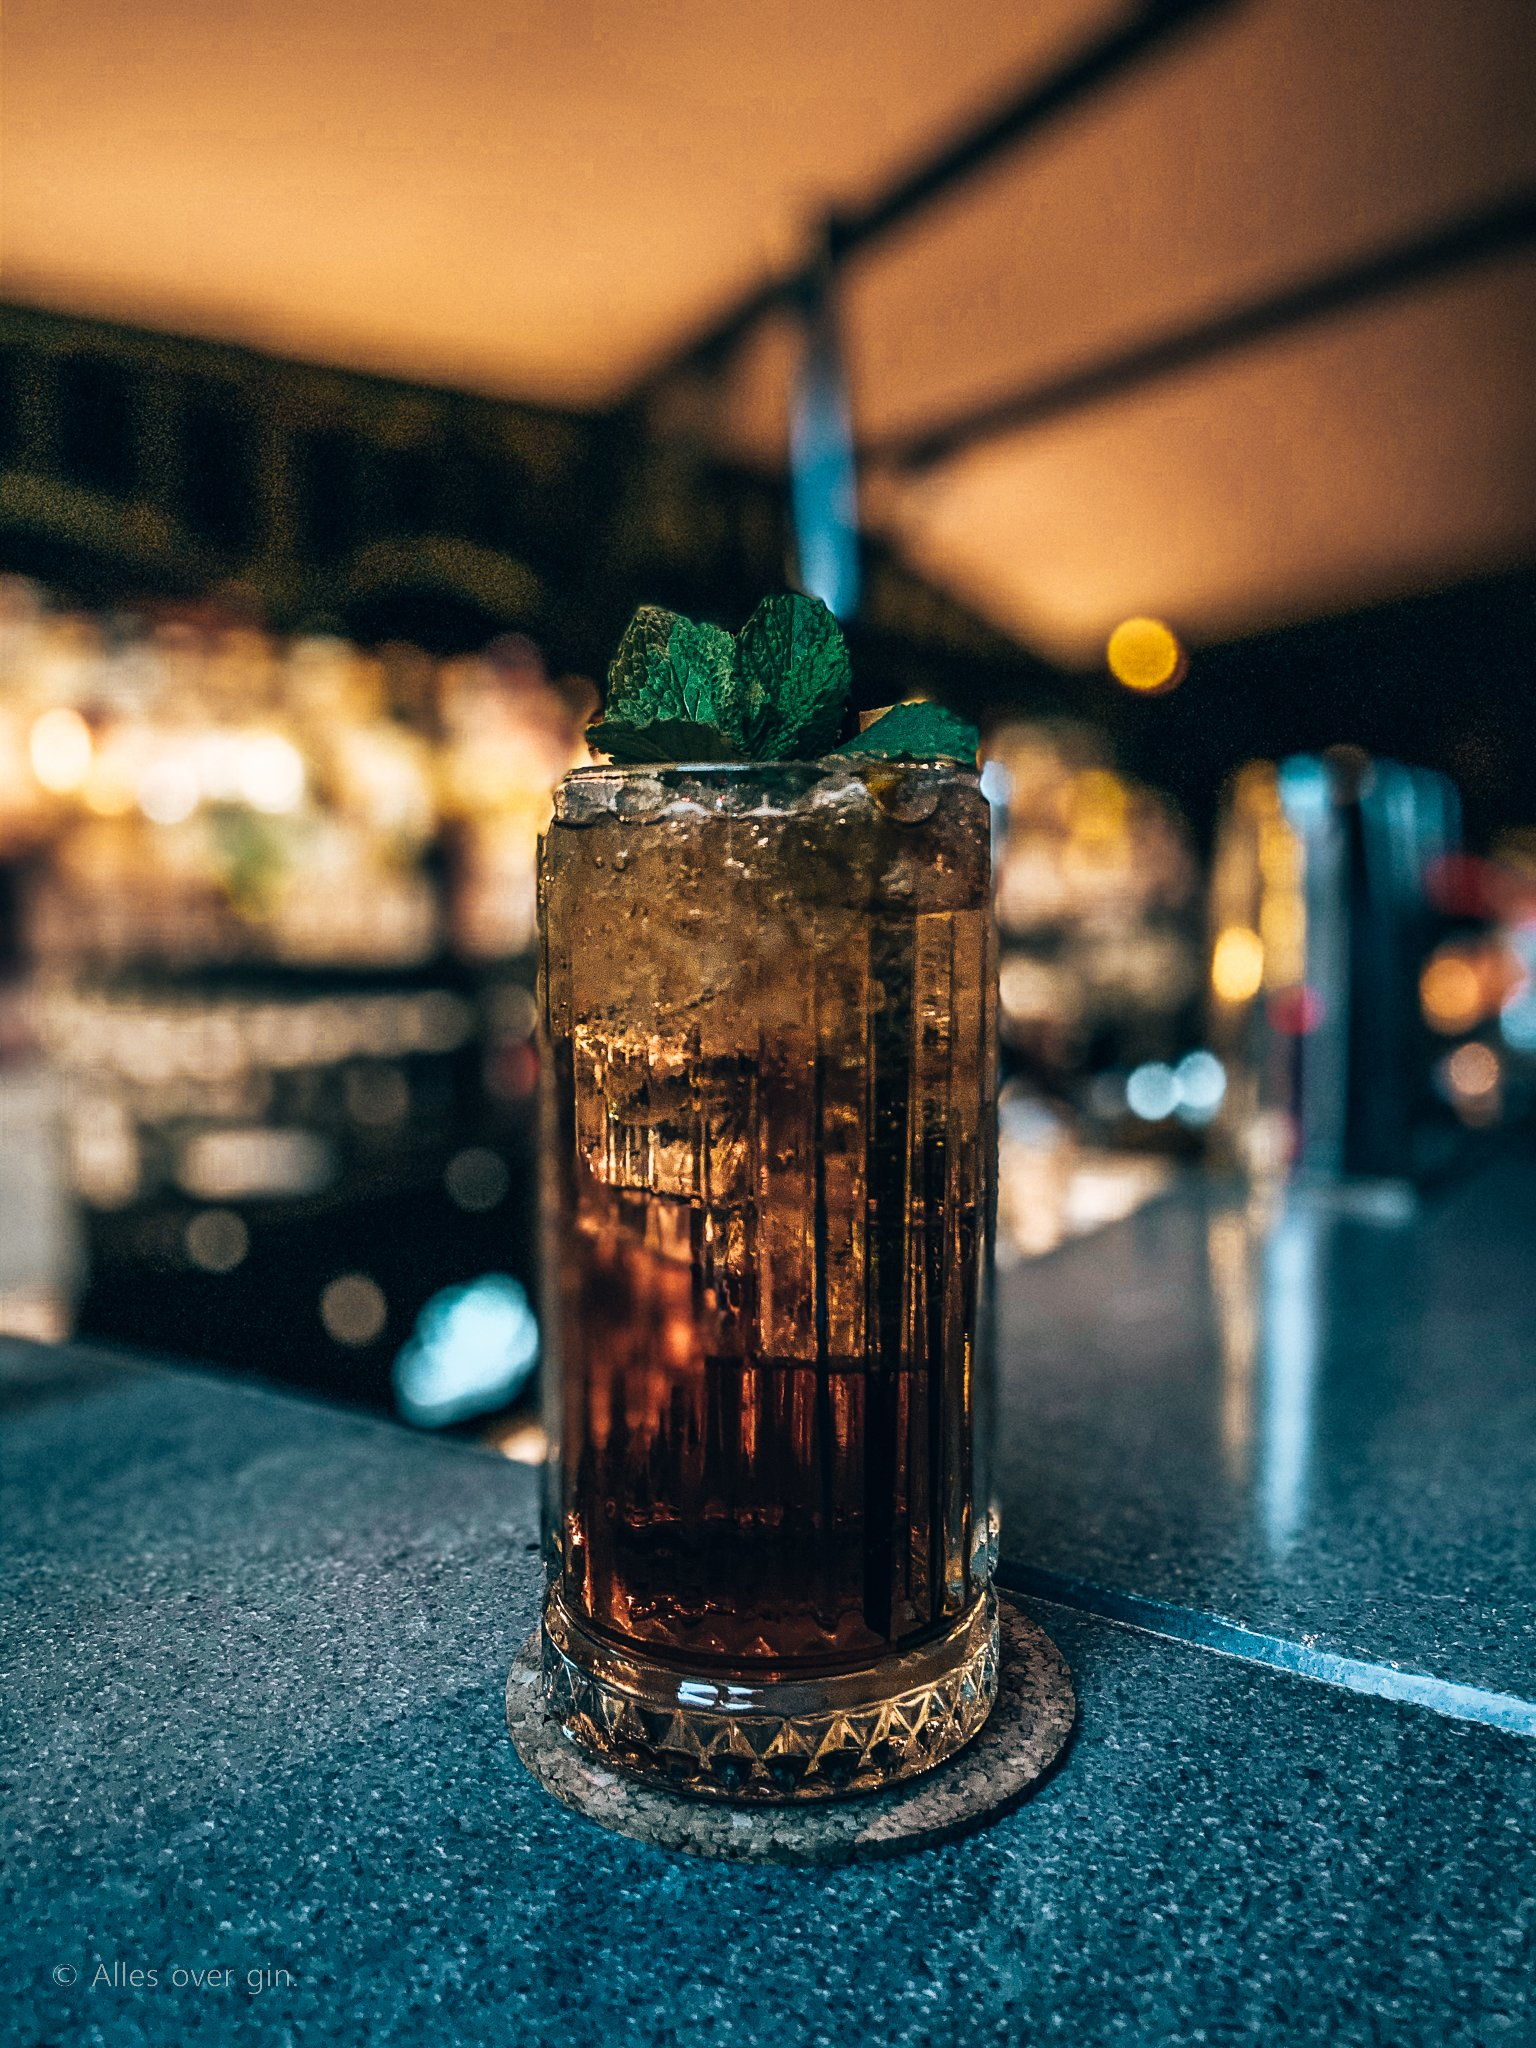 Cocktails drinken bij Bar Mokum, Amsterdam, Alles over gin.